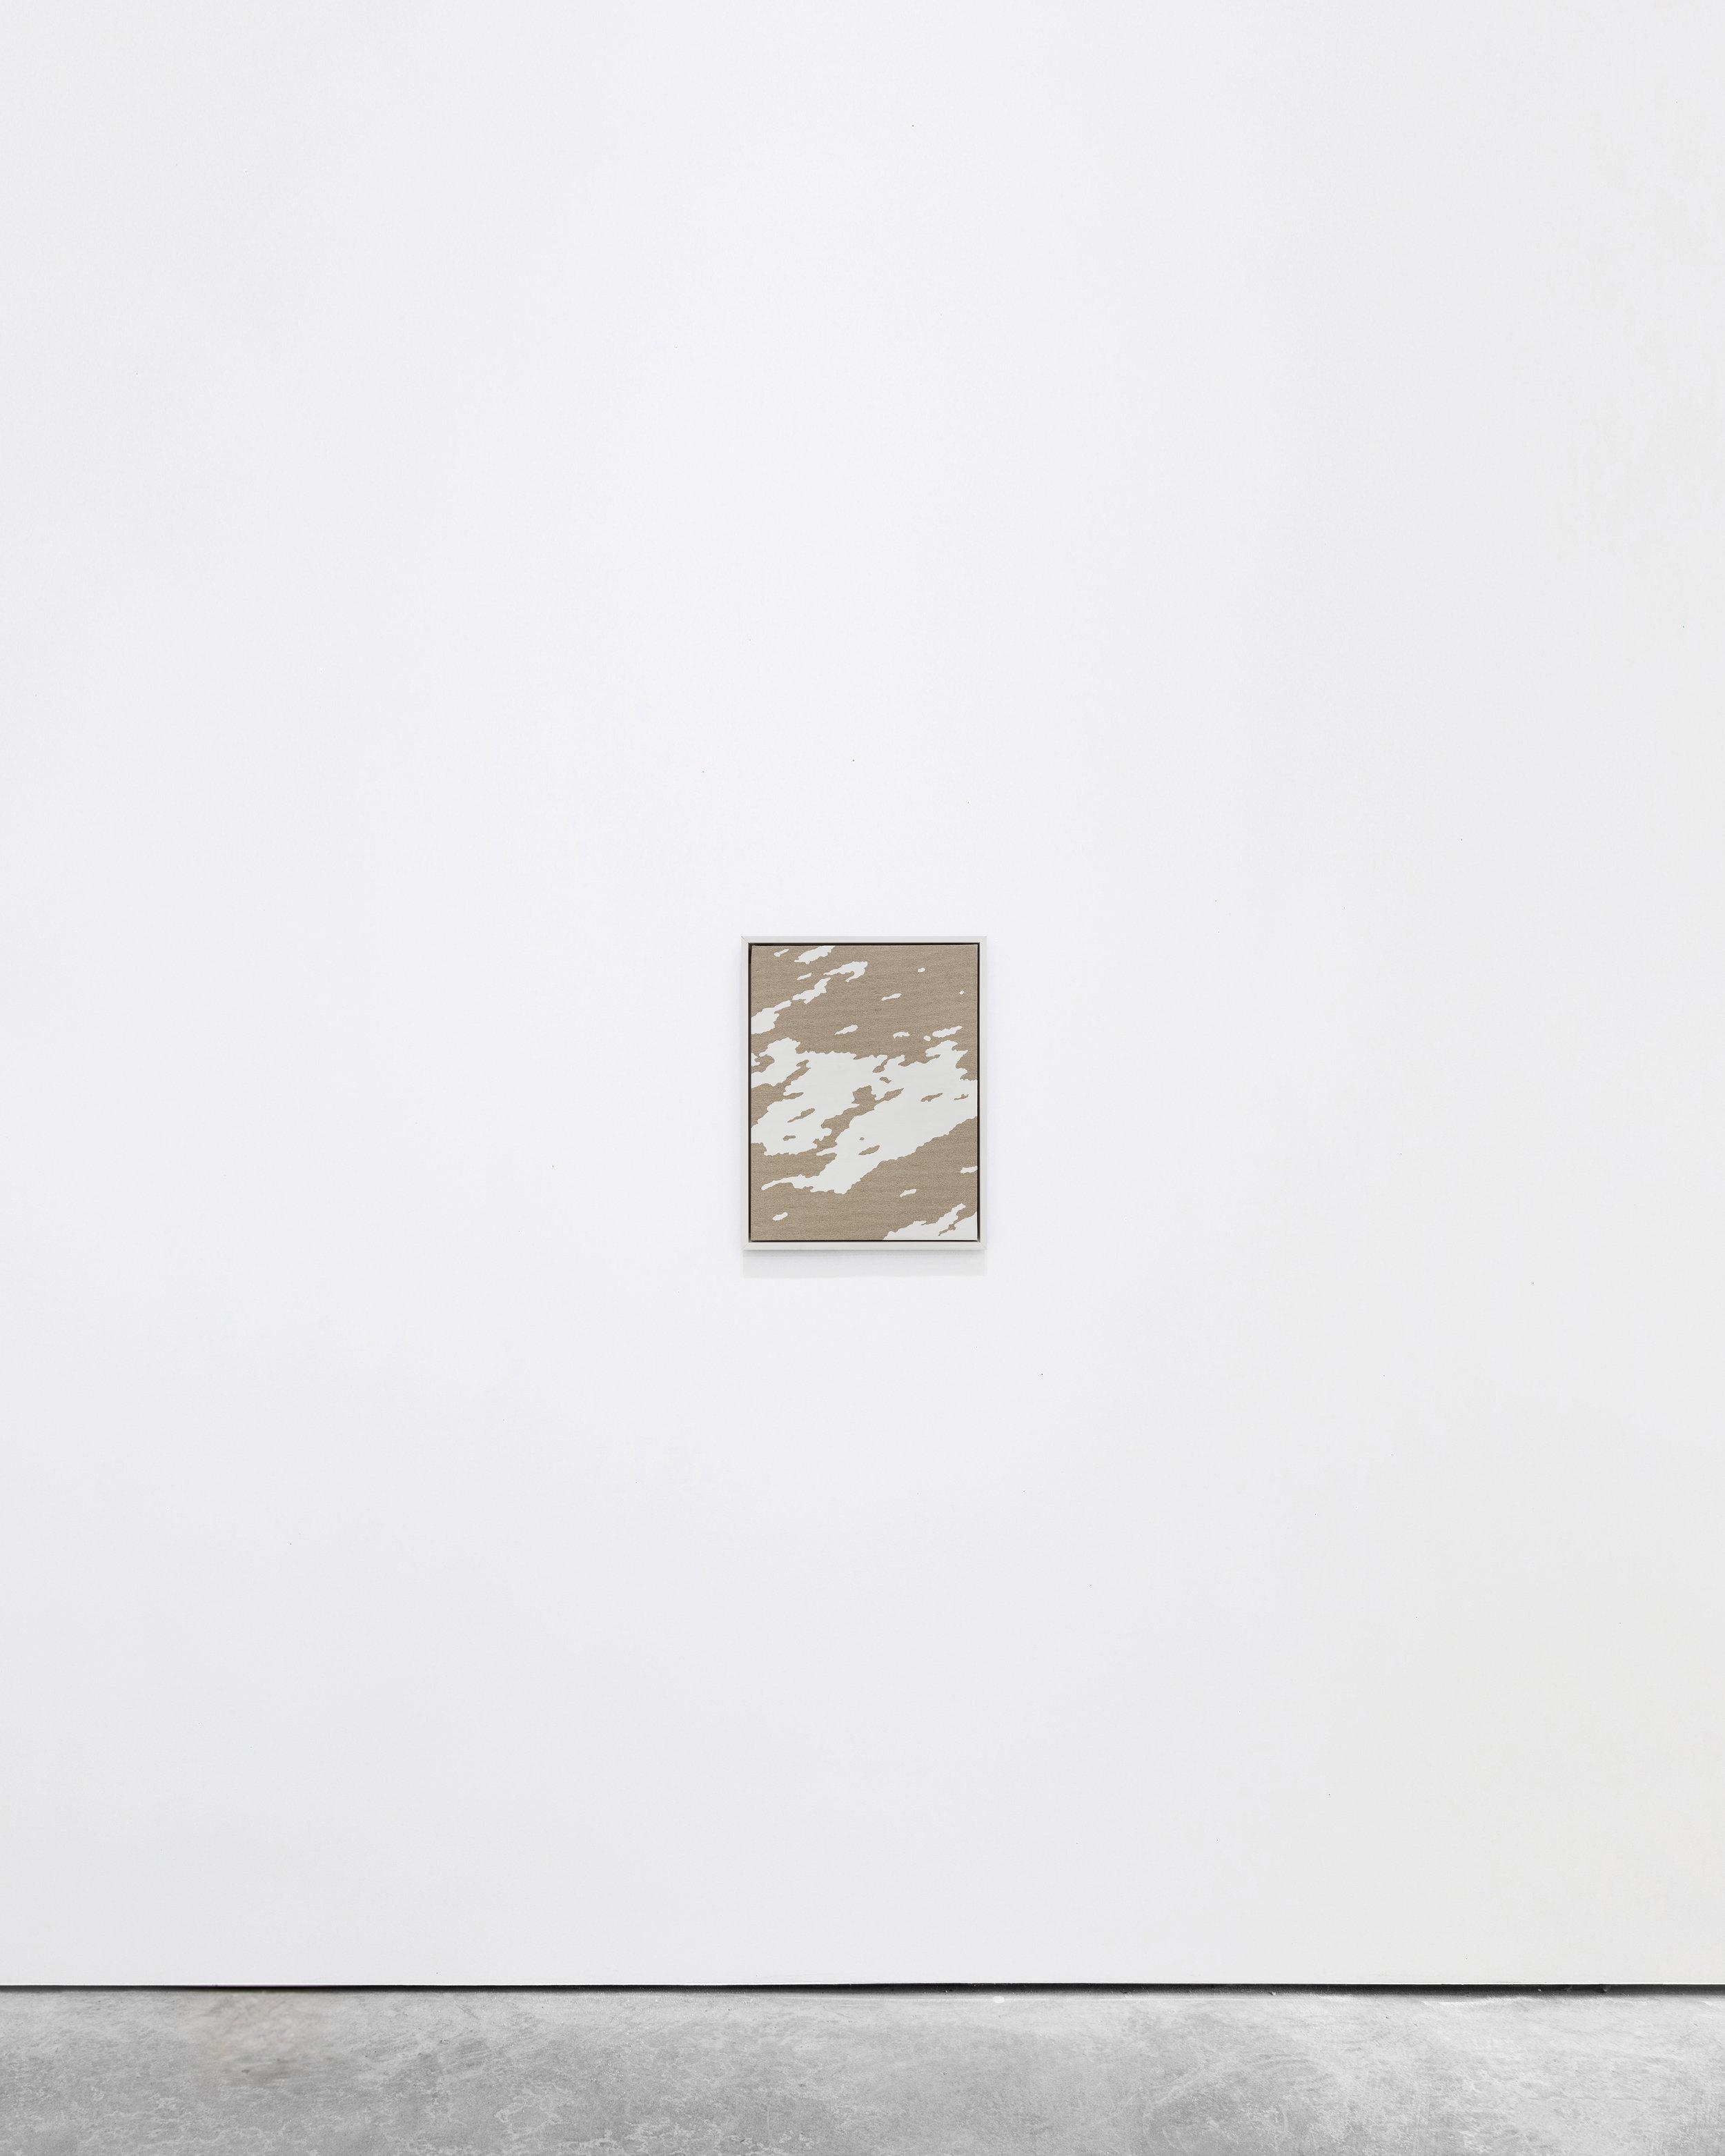 Pedro Matos  Early morning mist , 2016 Acrylic enamel on unprimed linen, wood frame 40 x 30 cm